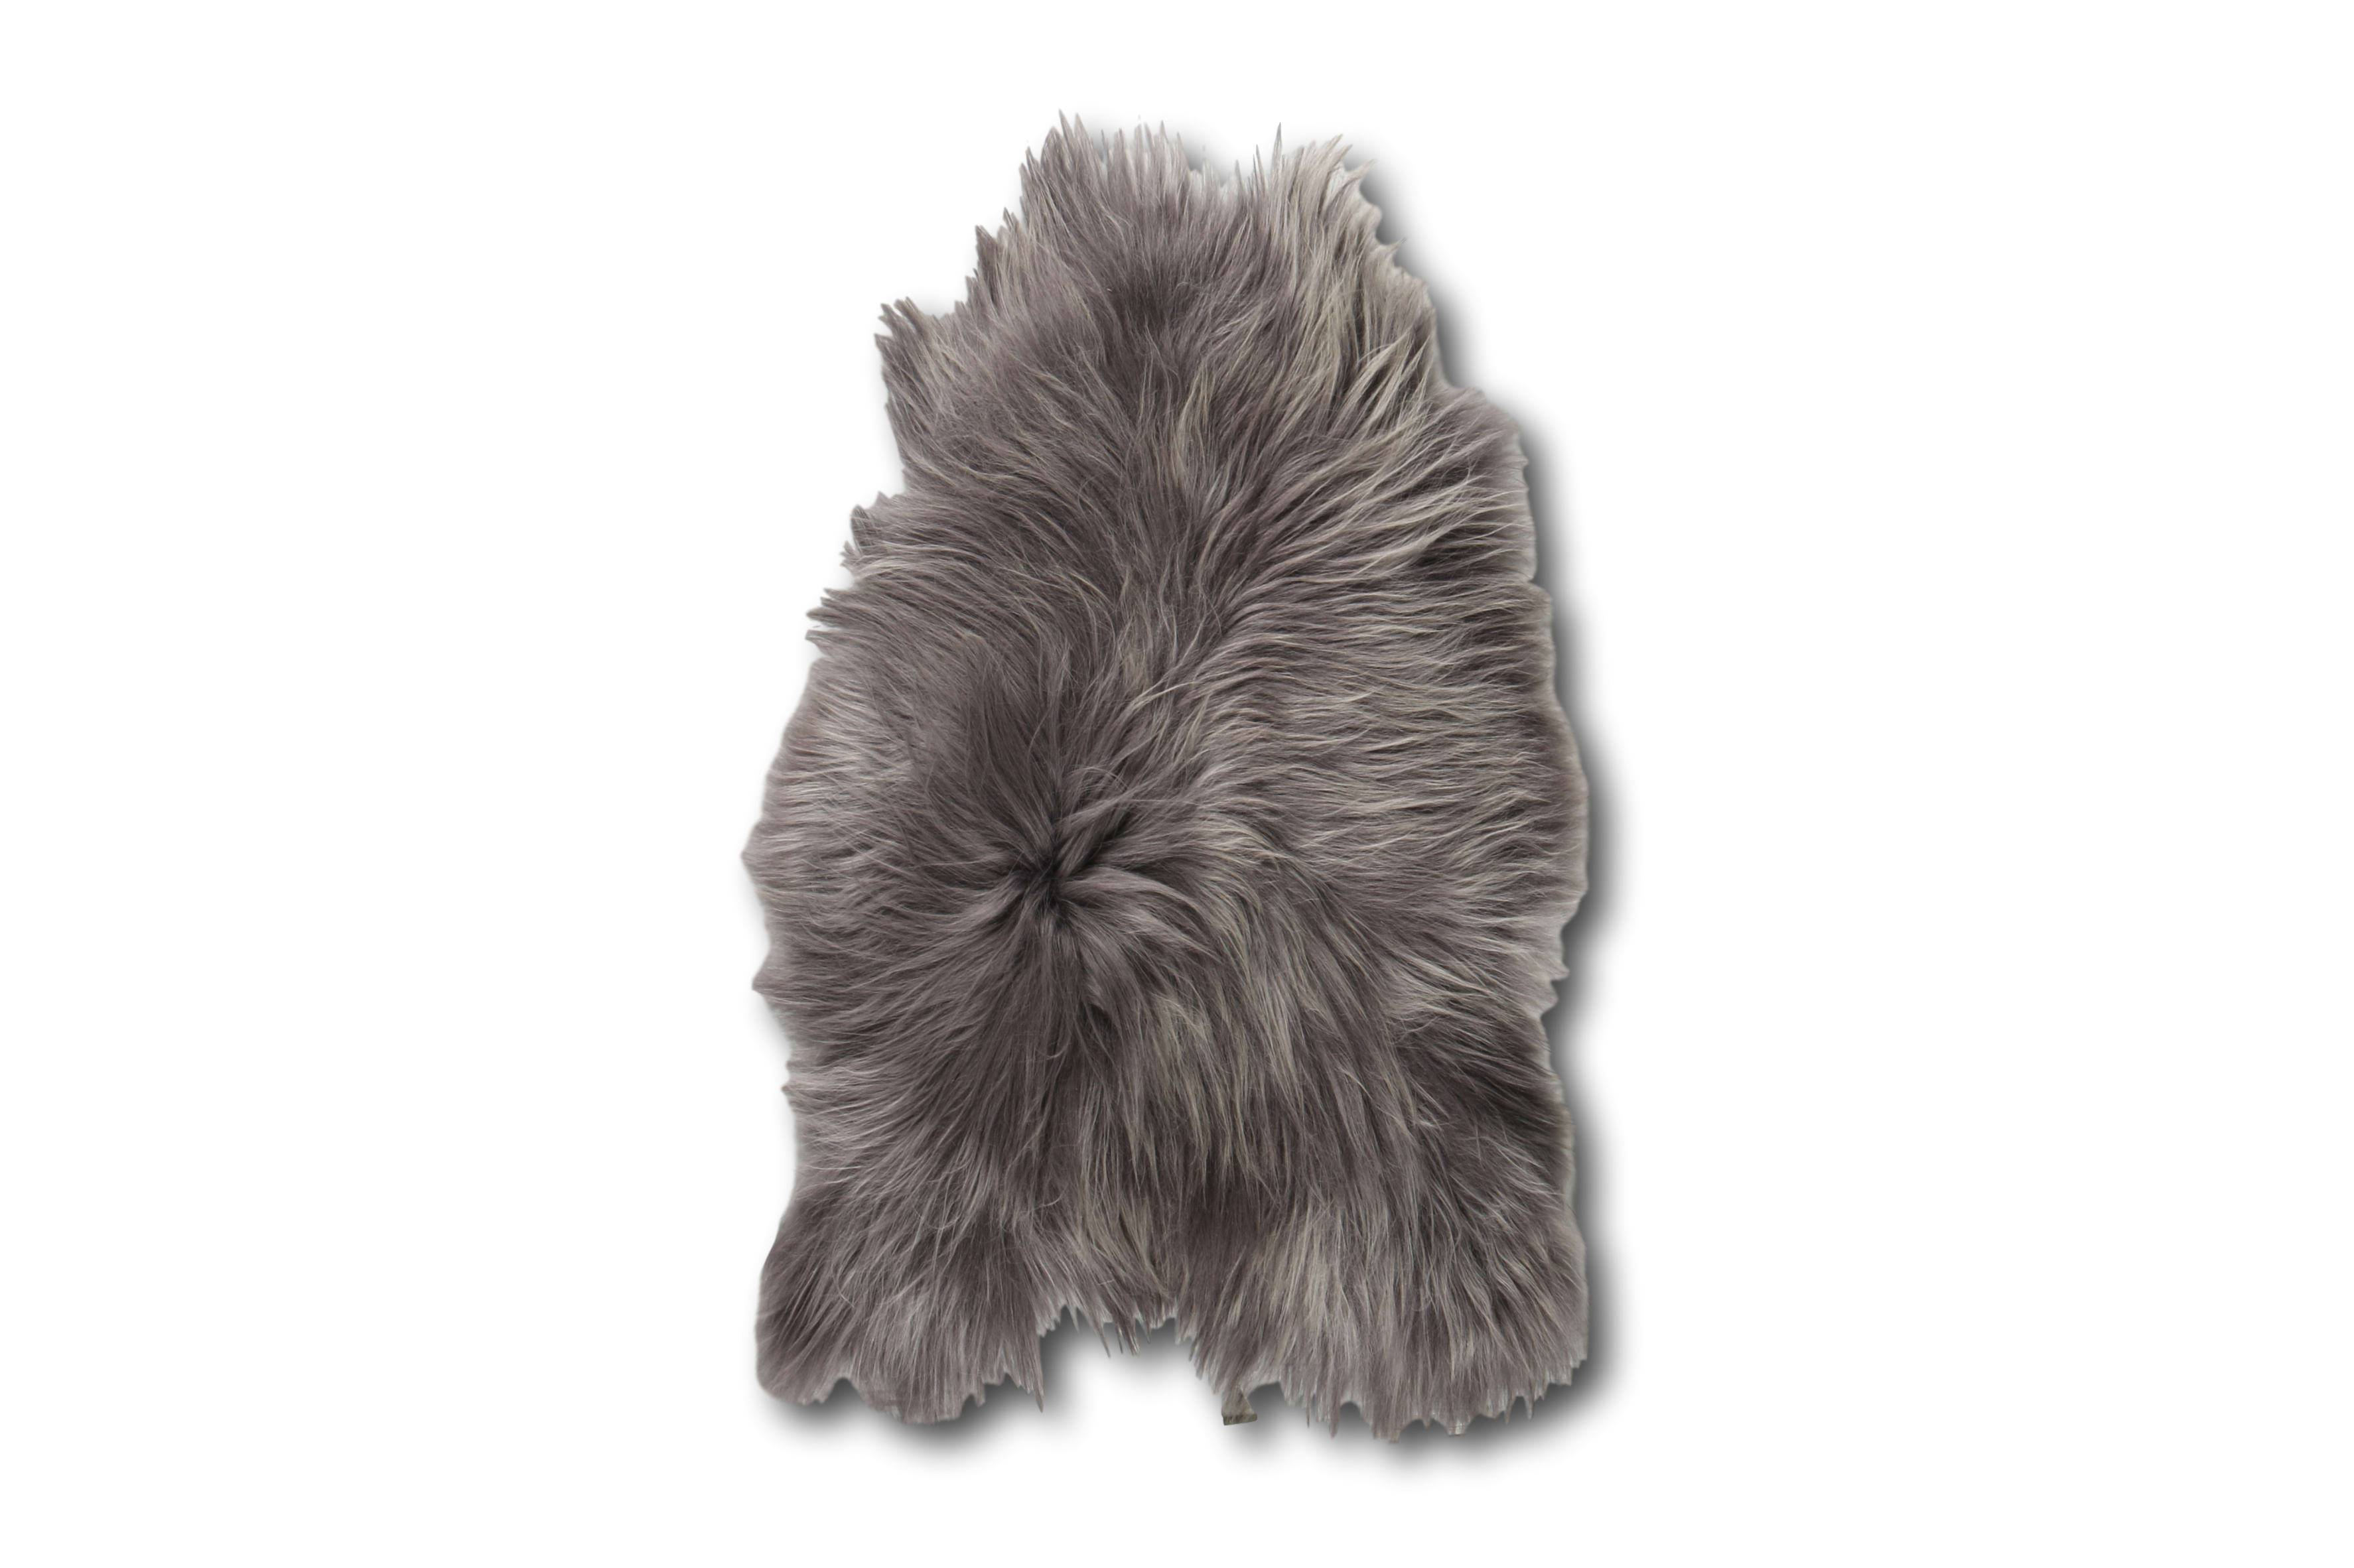 Esbeco Tapis en peau de mouton islandais acier 90x60